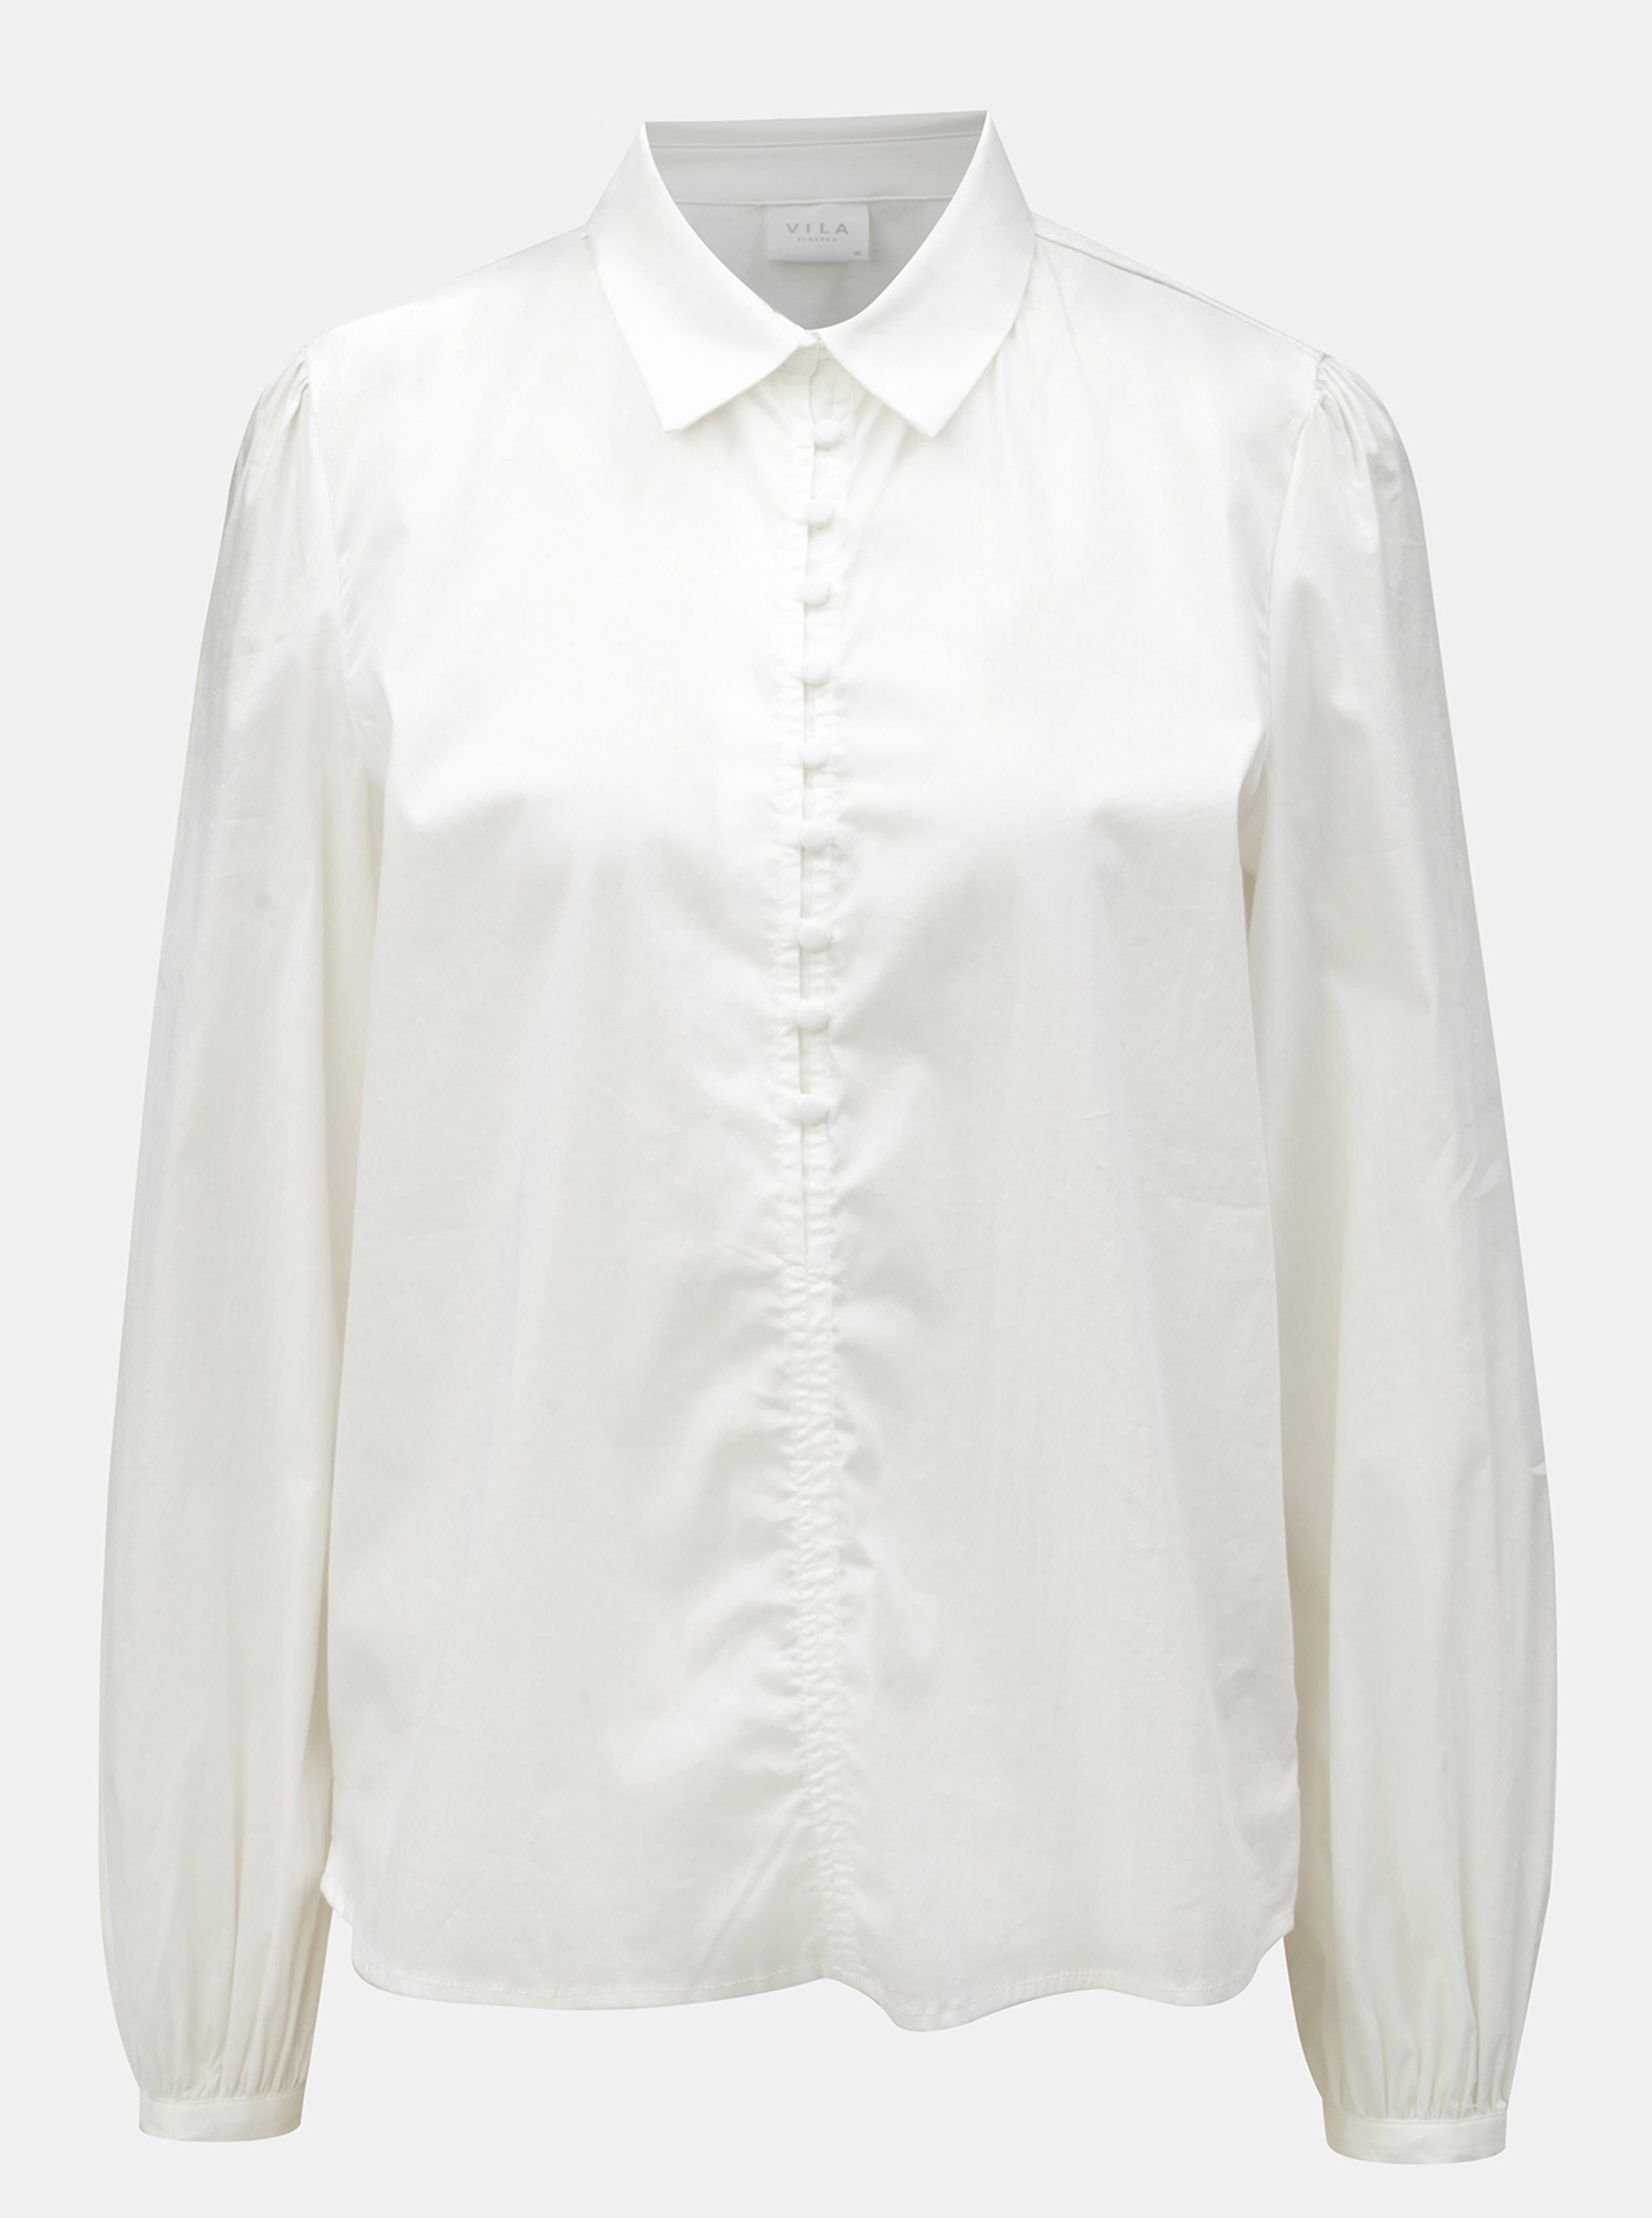 Bílá košile VILA Placket